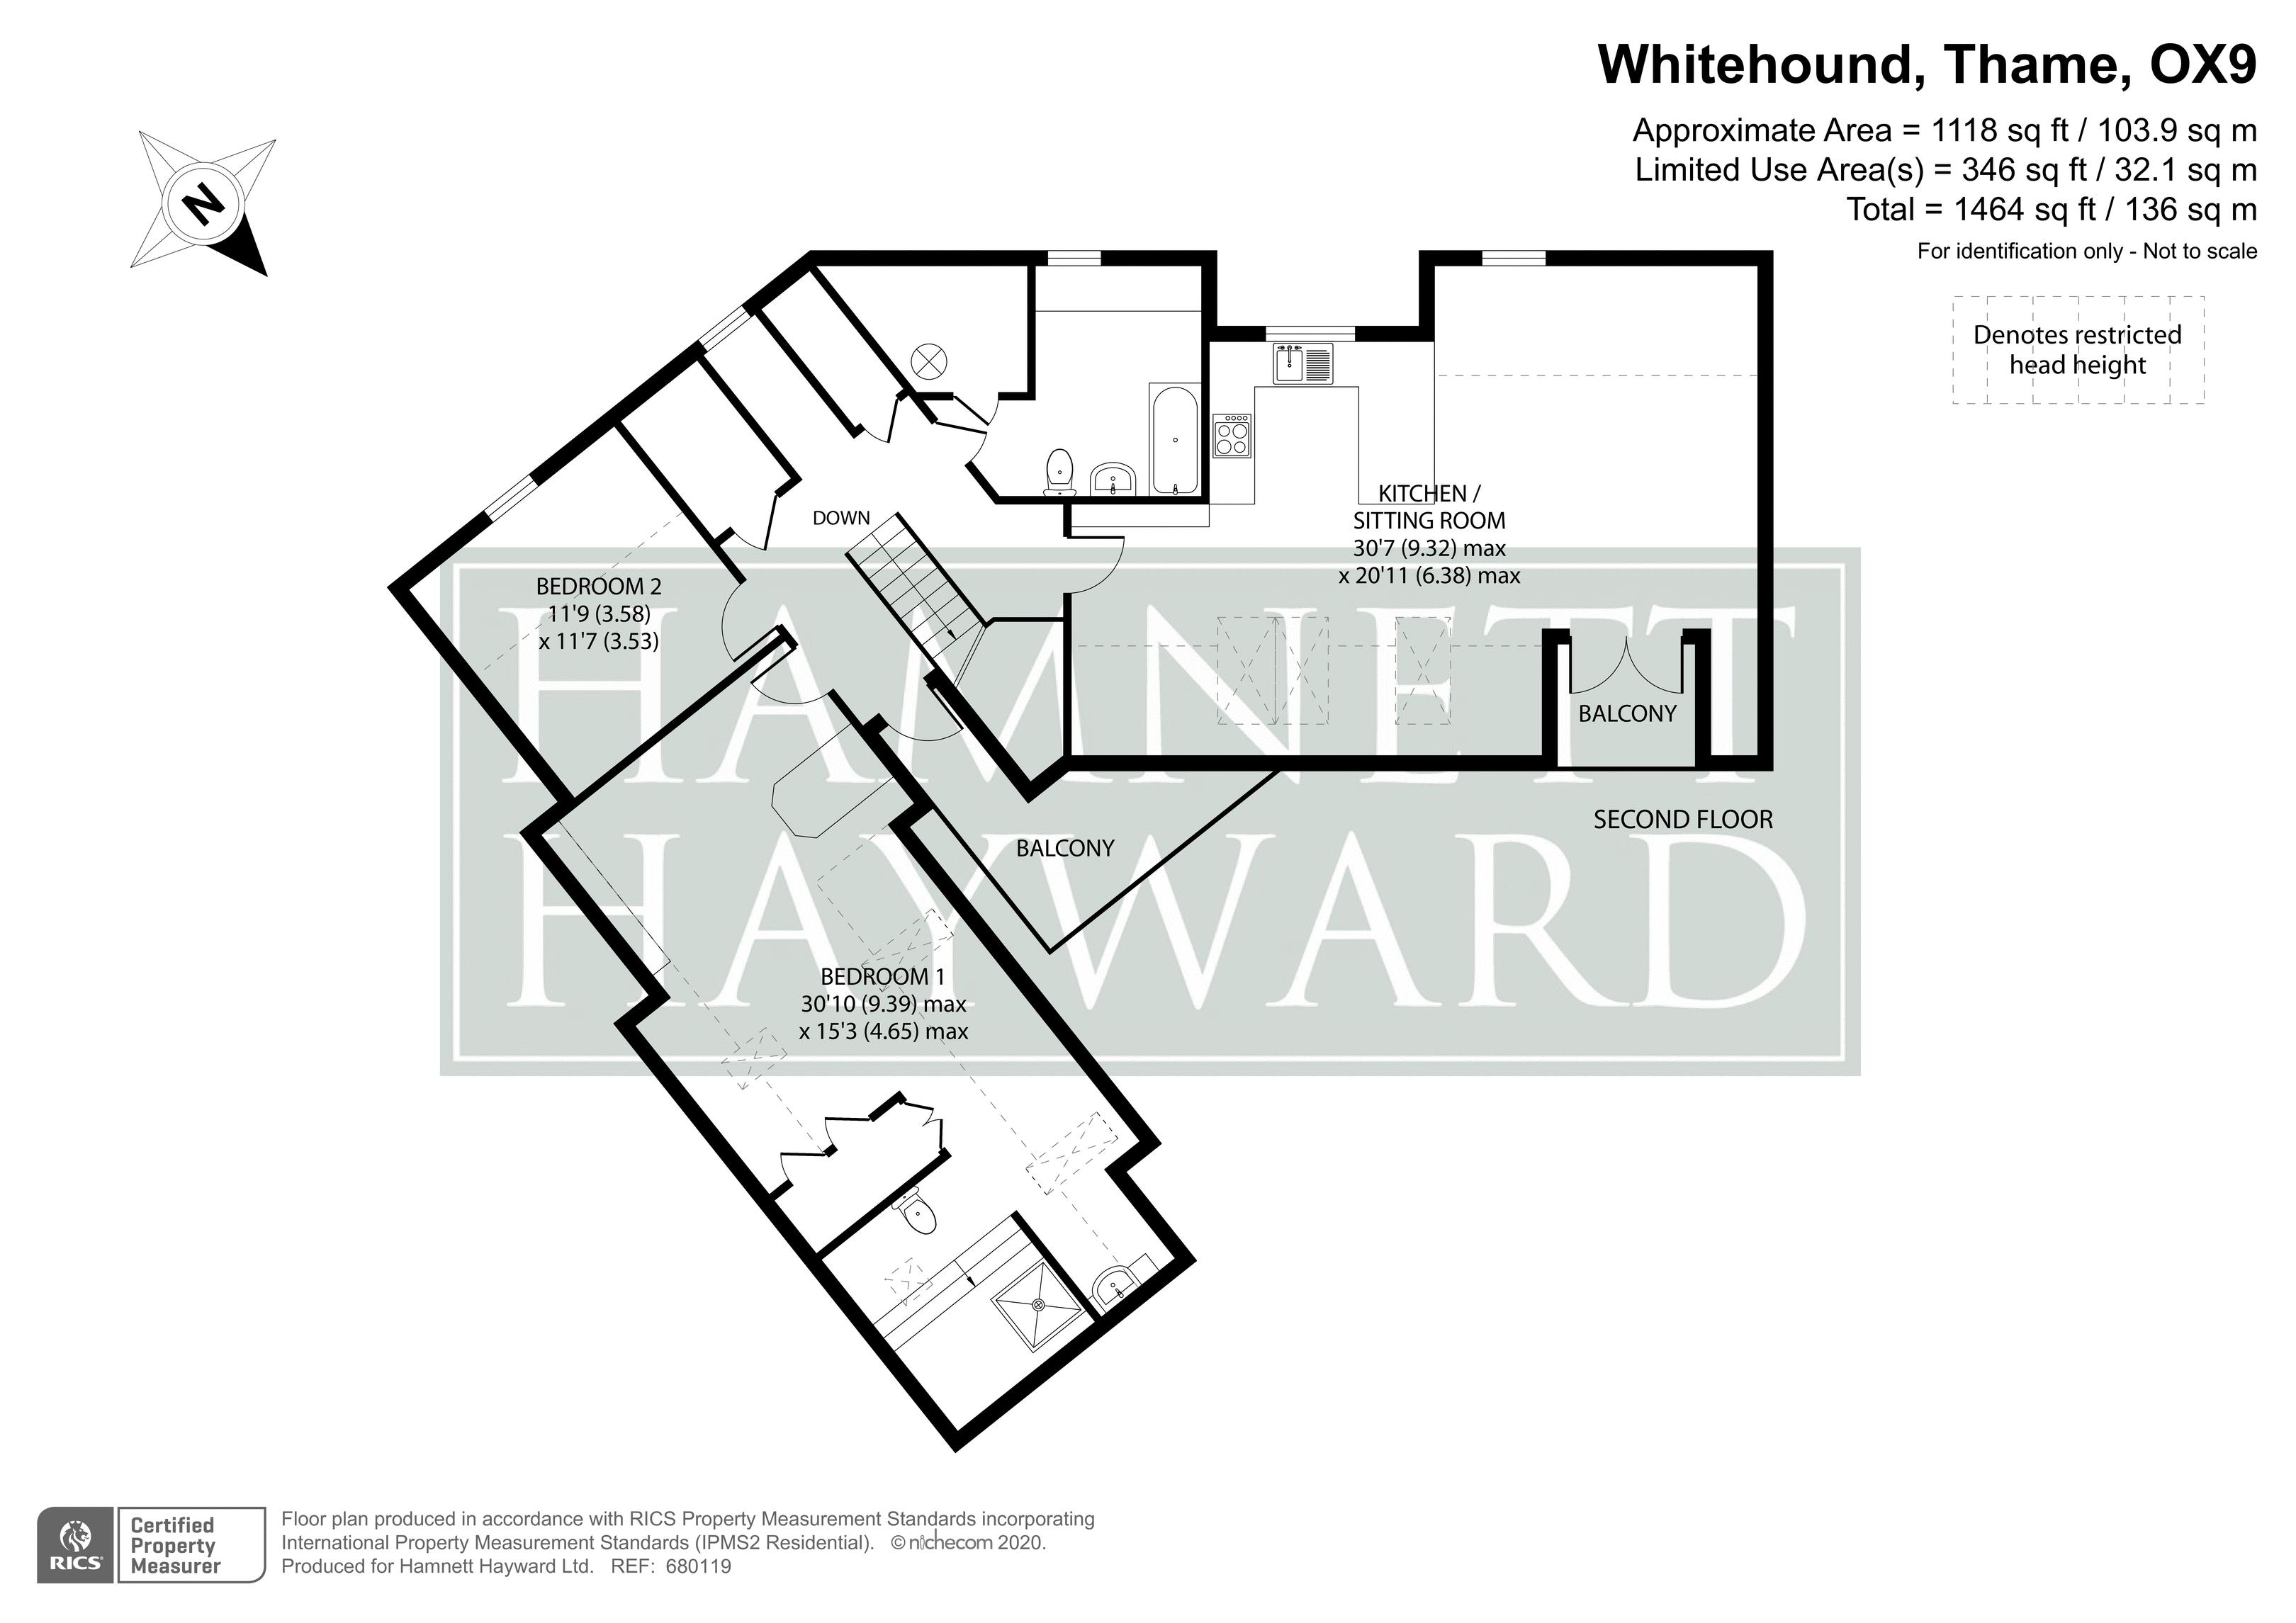 Whitehound